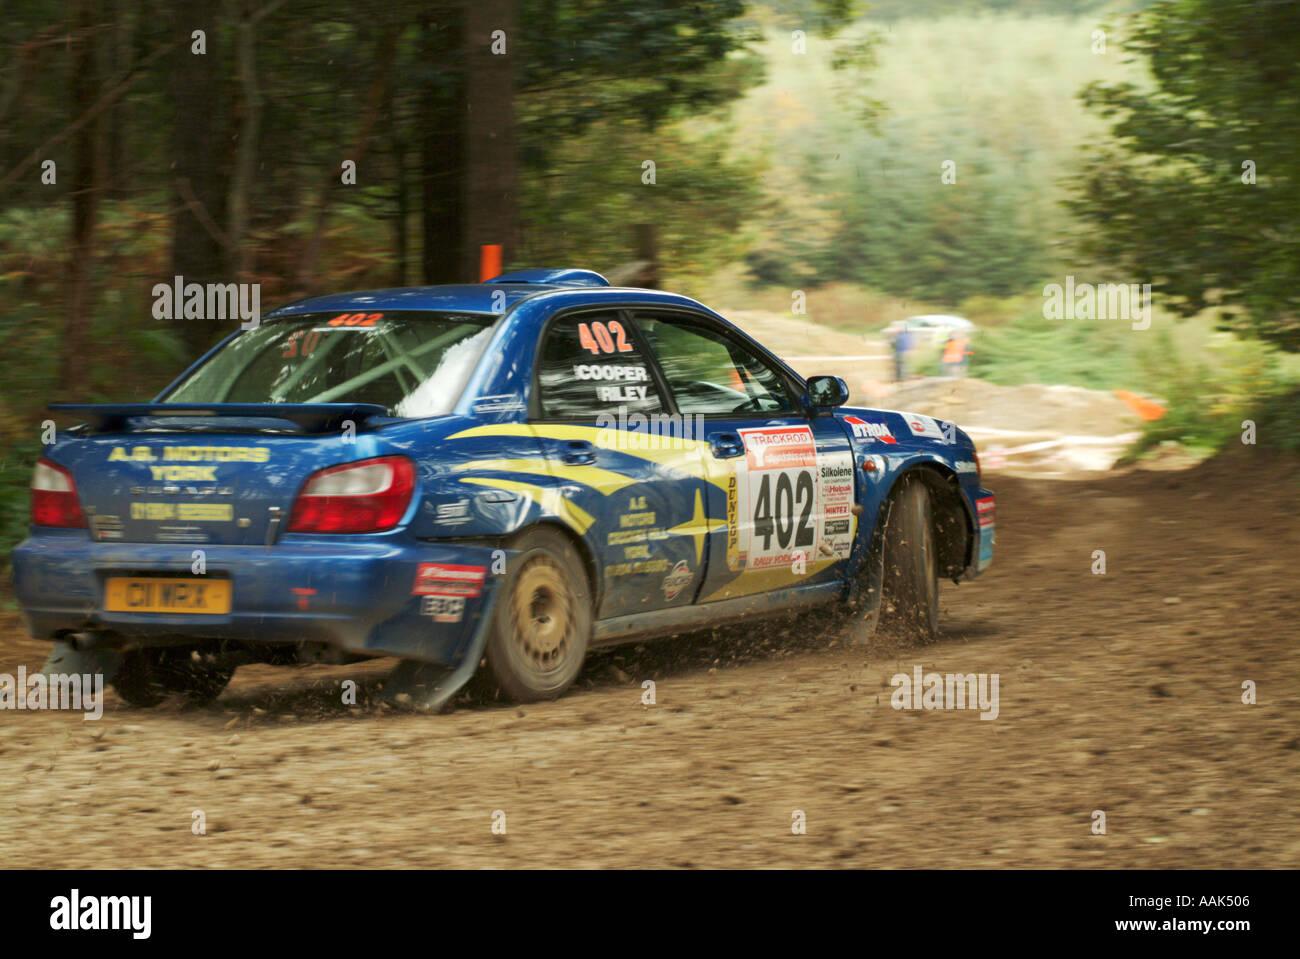 Subaru Rally Car Stock Photos & Subaru Rally Car Stock Images - Alamy